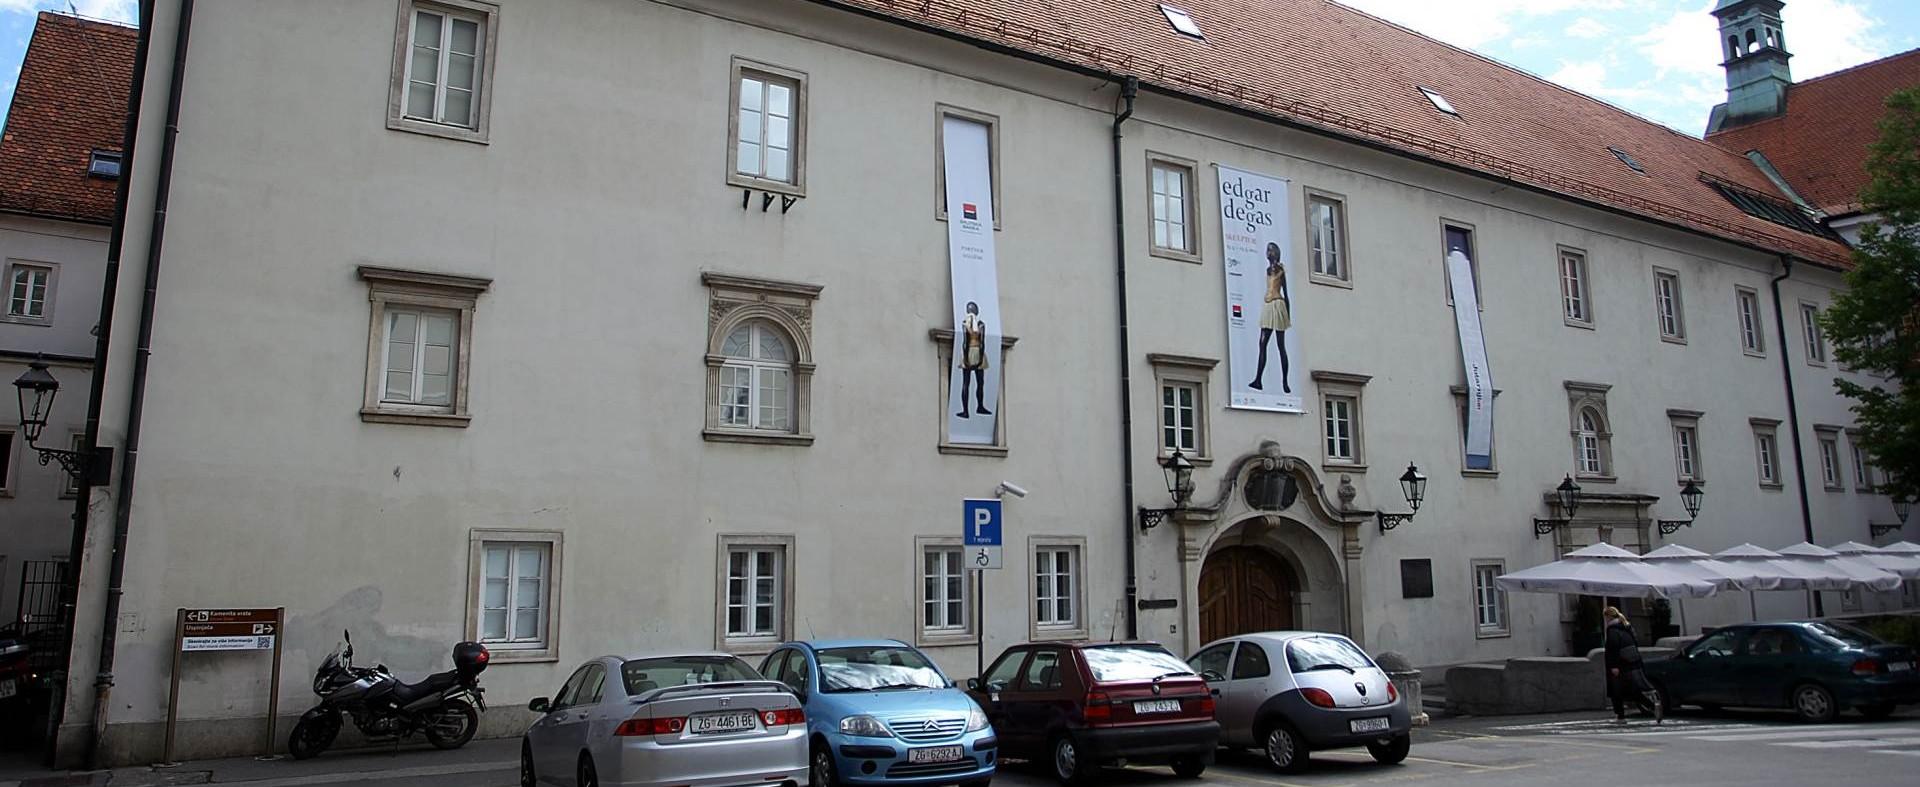 FOTO: Galerija Klovićevi dvori otvara izložbu 'Izazov moderne: Zagreb – Beč oko 1900.'